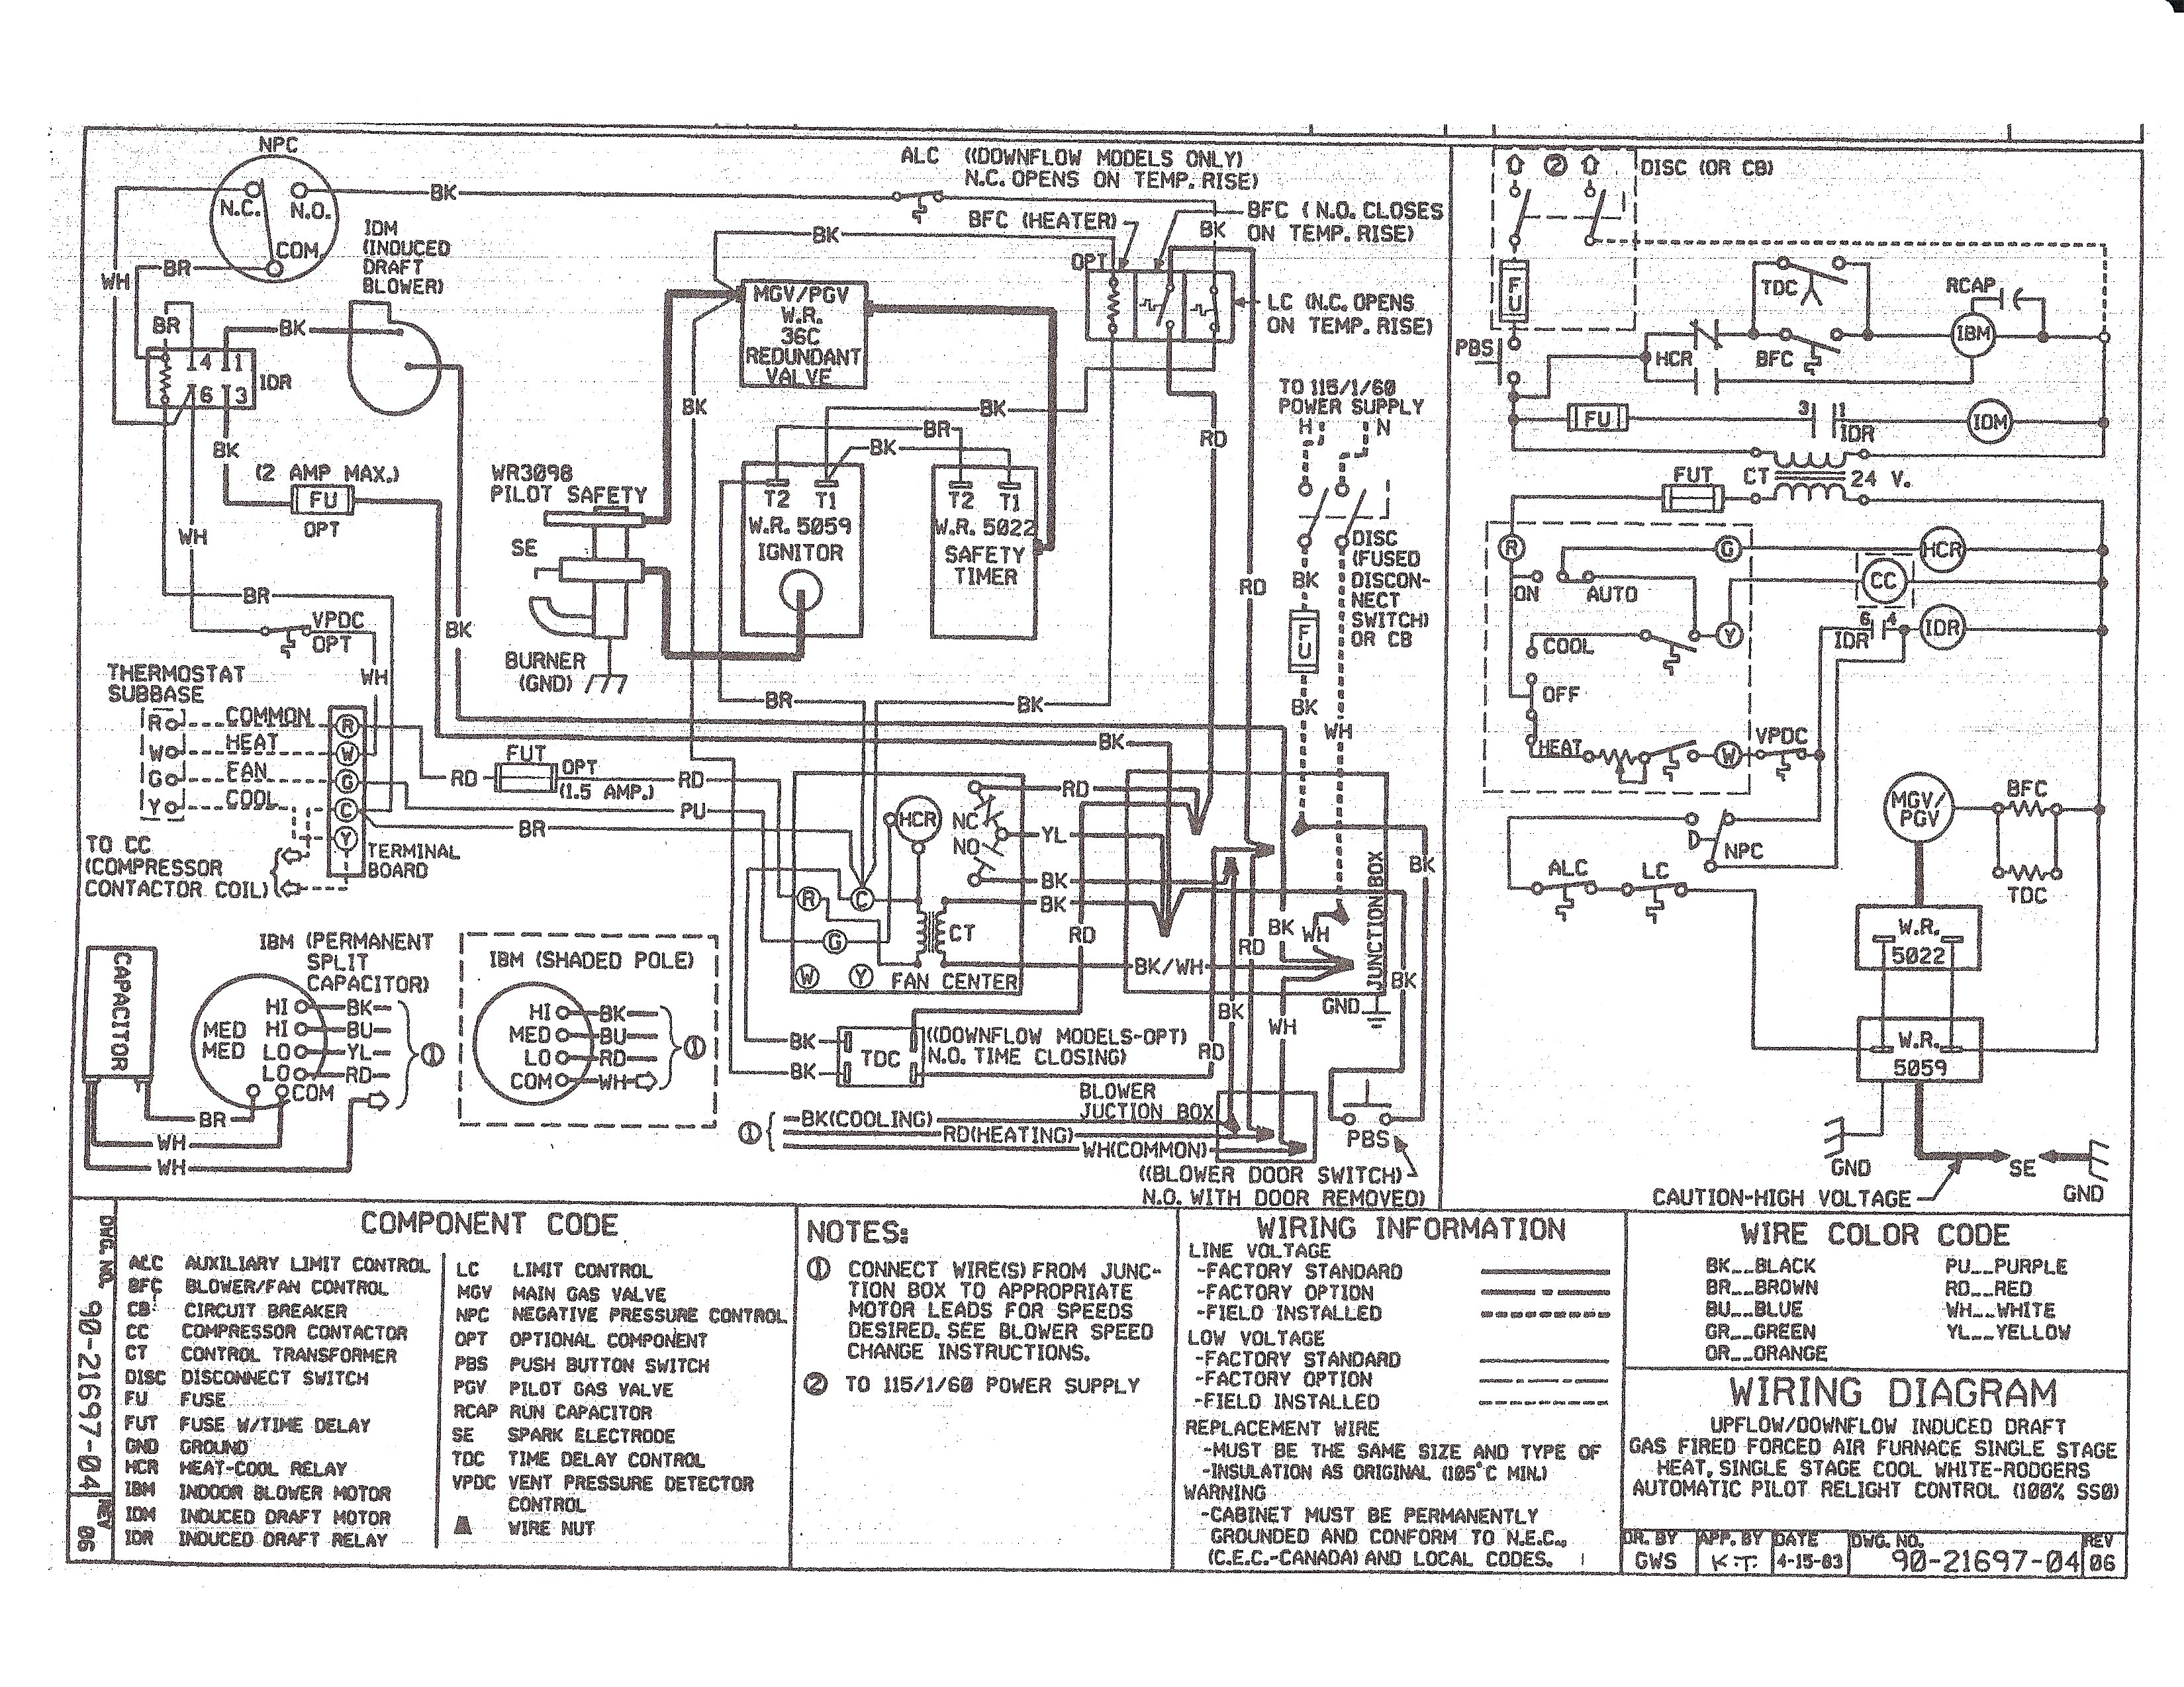 American Standard Furnace Wiring Diagram Gas Furnace Wiring Diagram Exquisite Shape Older Label Beauteous Of American Standard Furnace Wiring Diagram